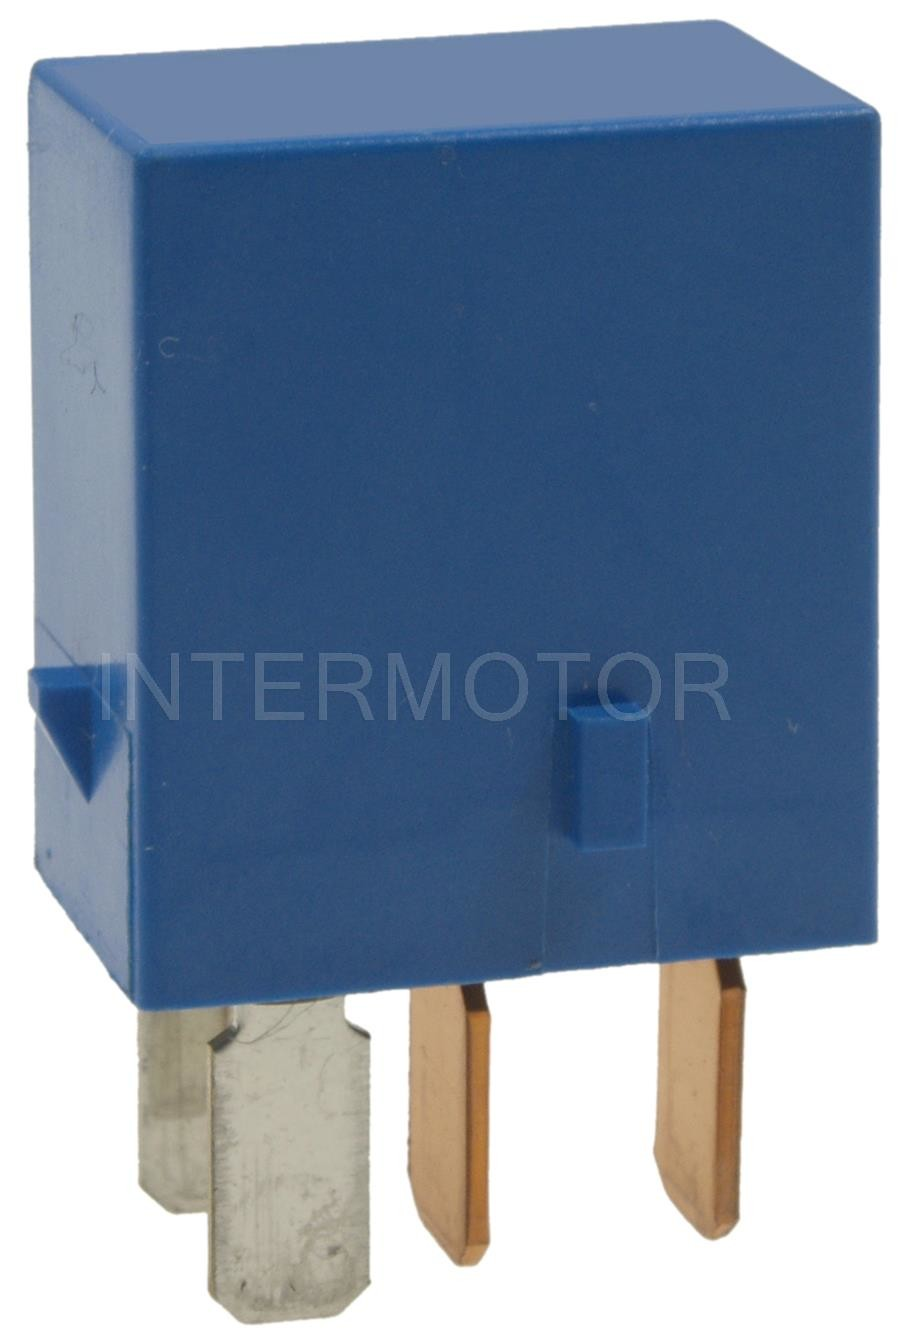 STANDARD INTERMOTOR WIRE - Starter Relay - STI RY-1052